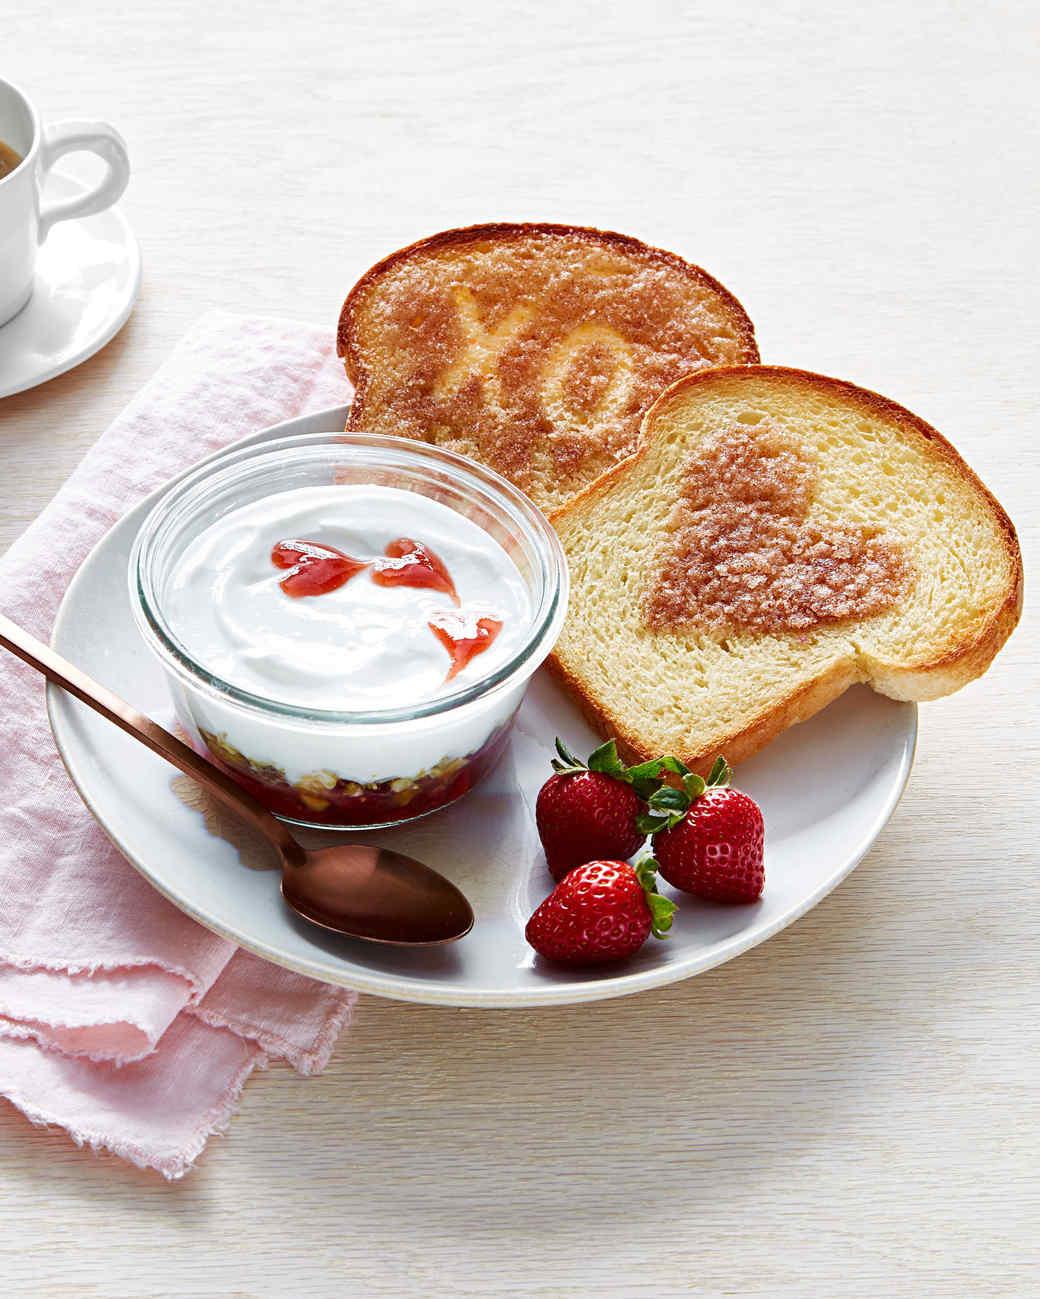 XO cinnamon toast and yogurt